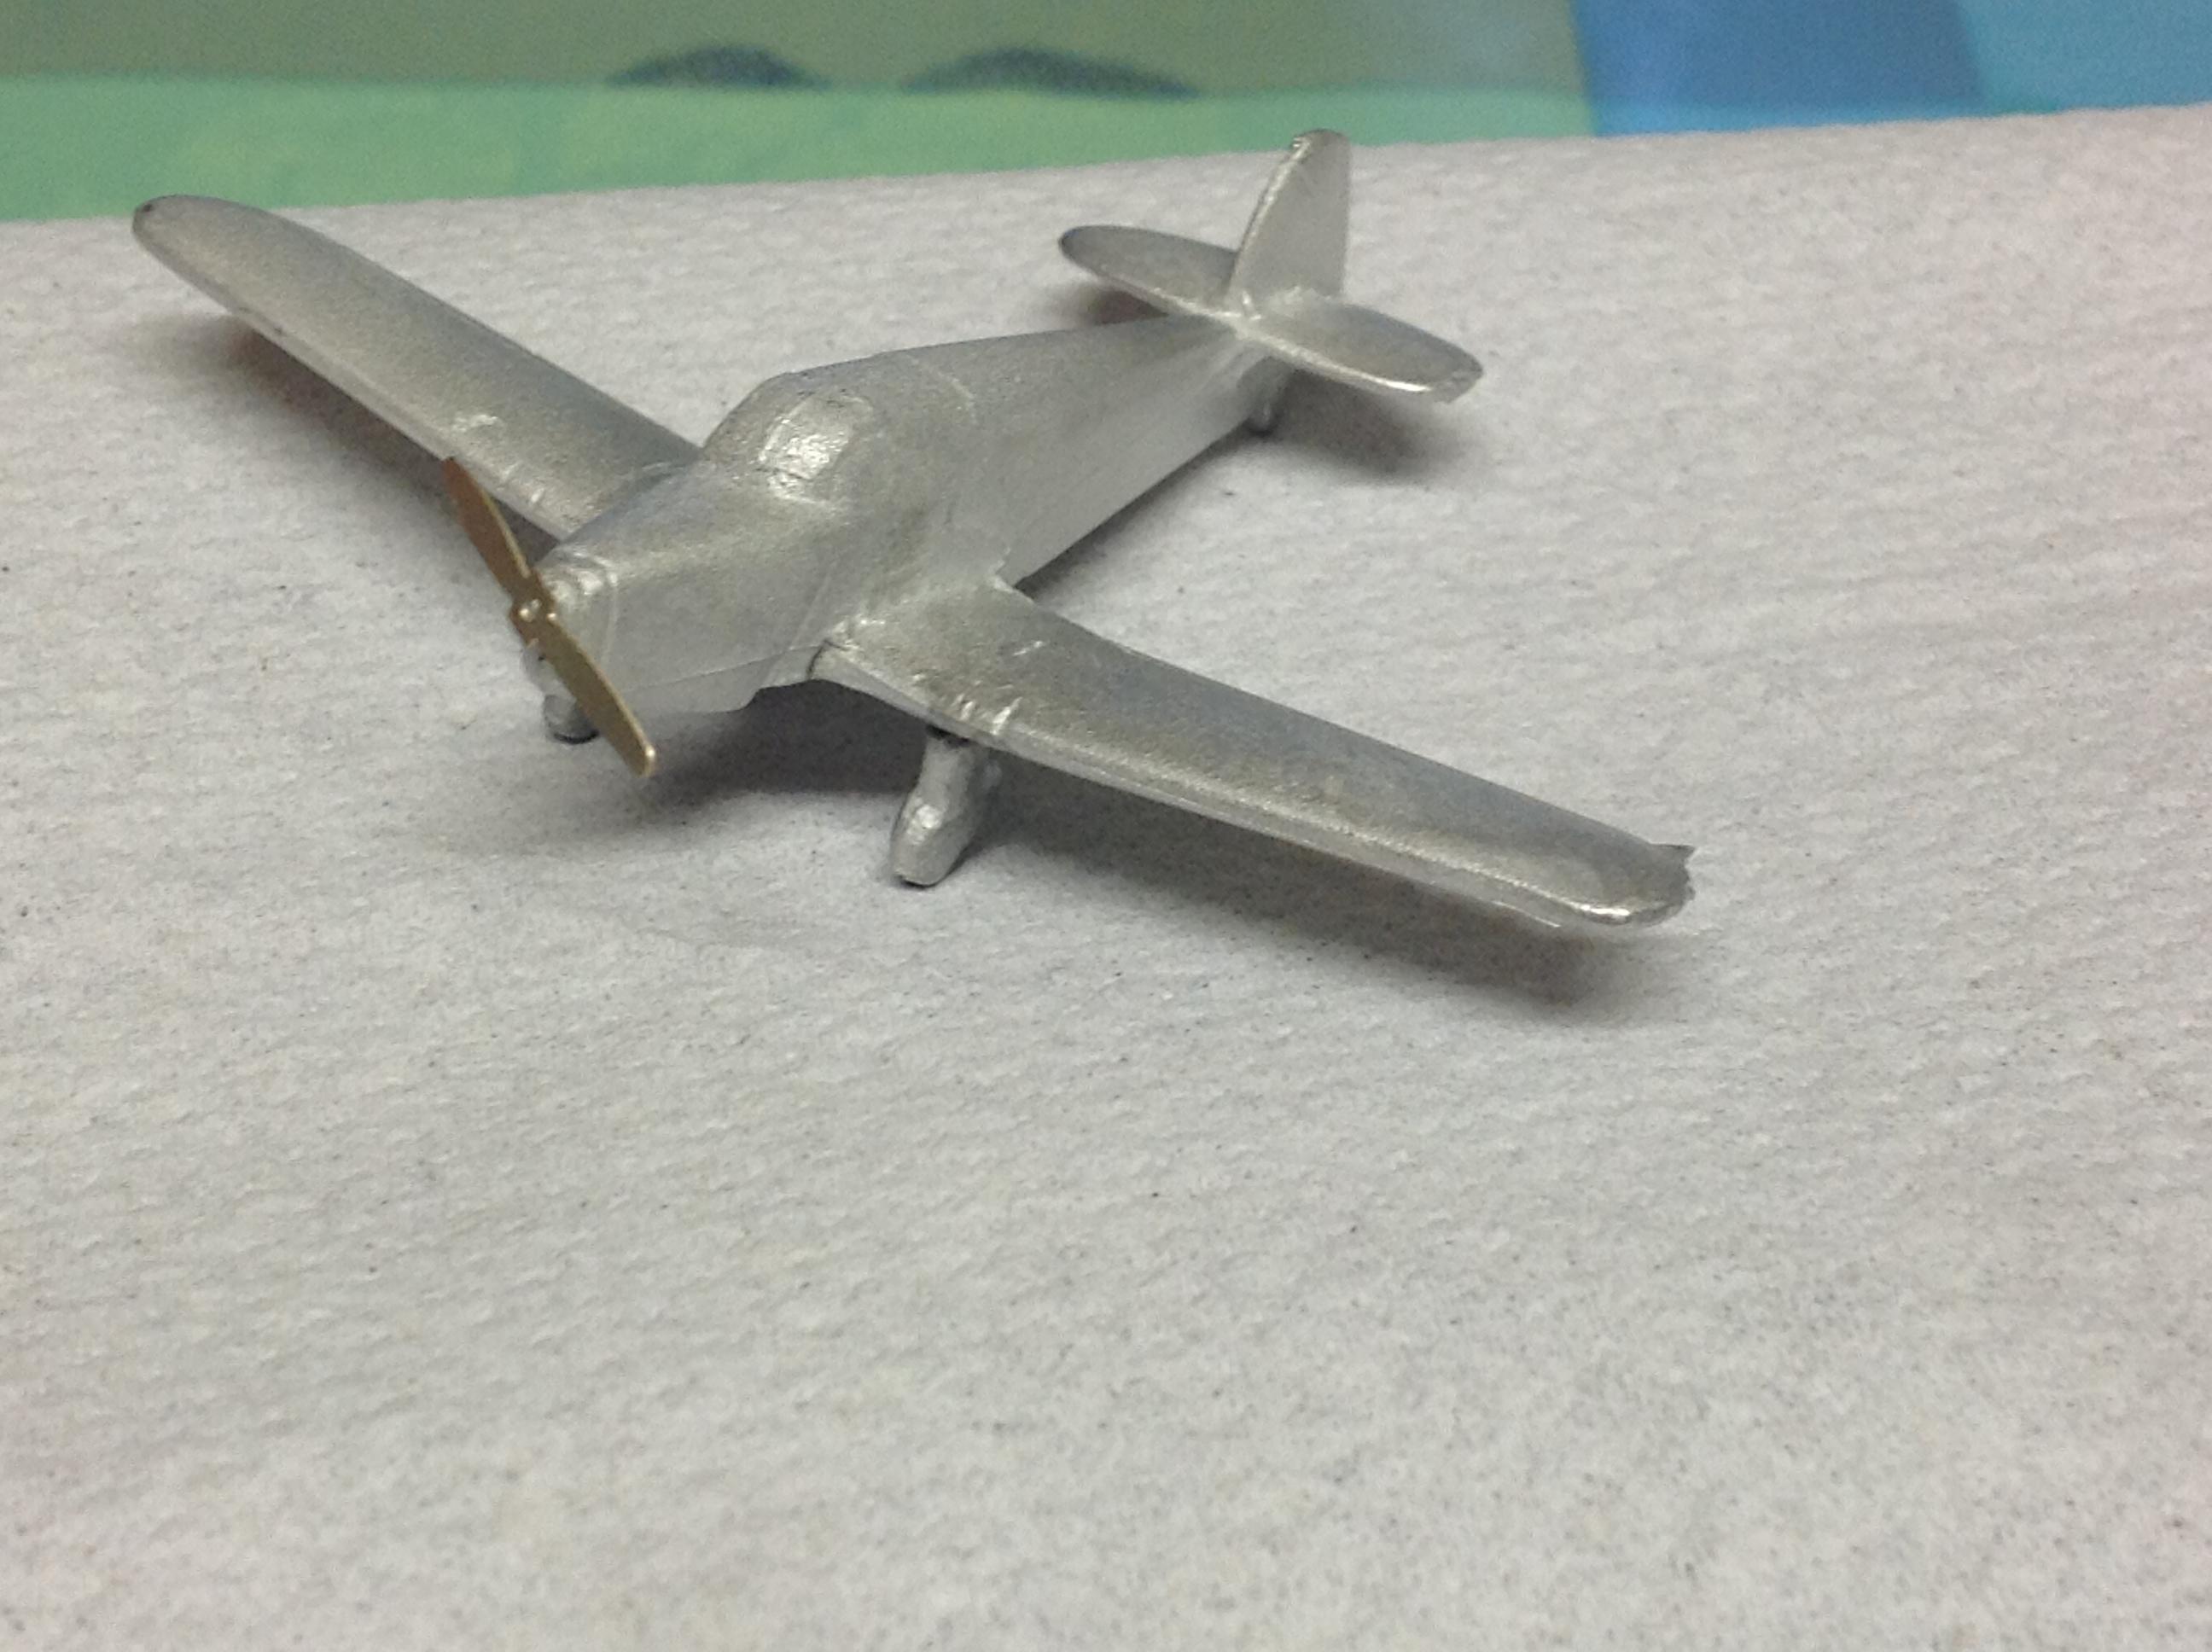 Air6 Proctor